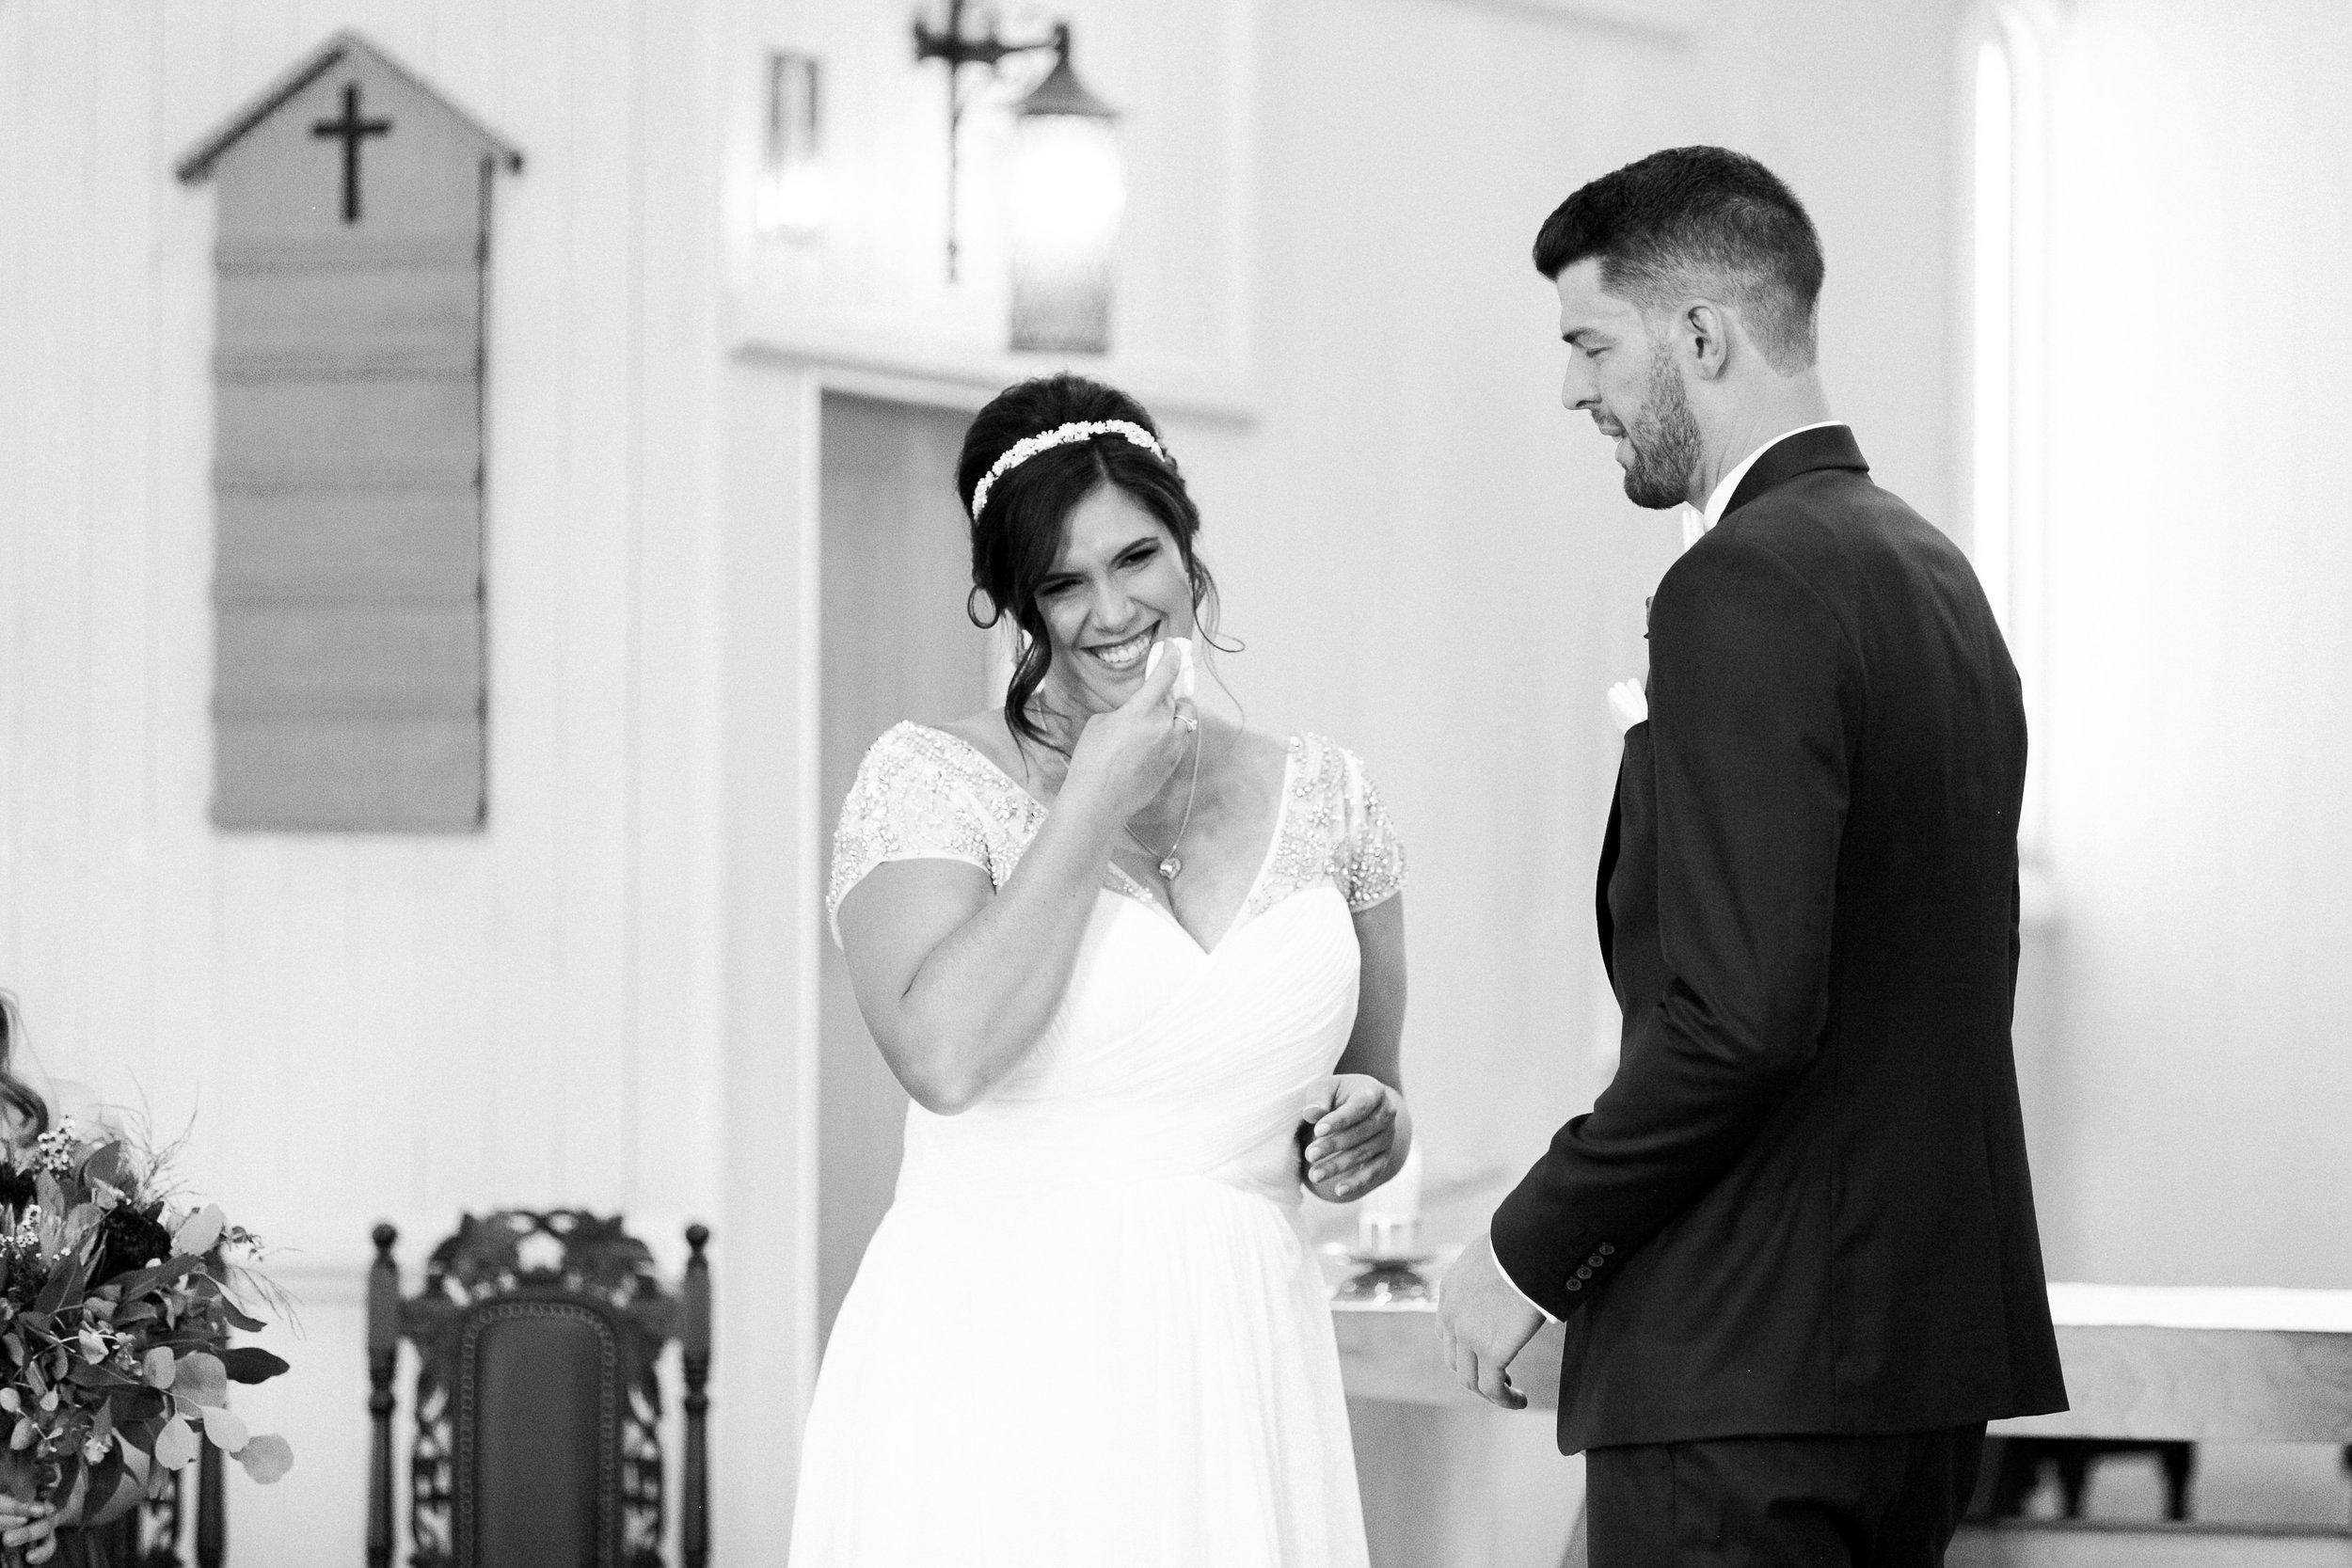 brisbane-city-wedding-photography-film-light-loft-westend-1-8.jpg